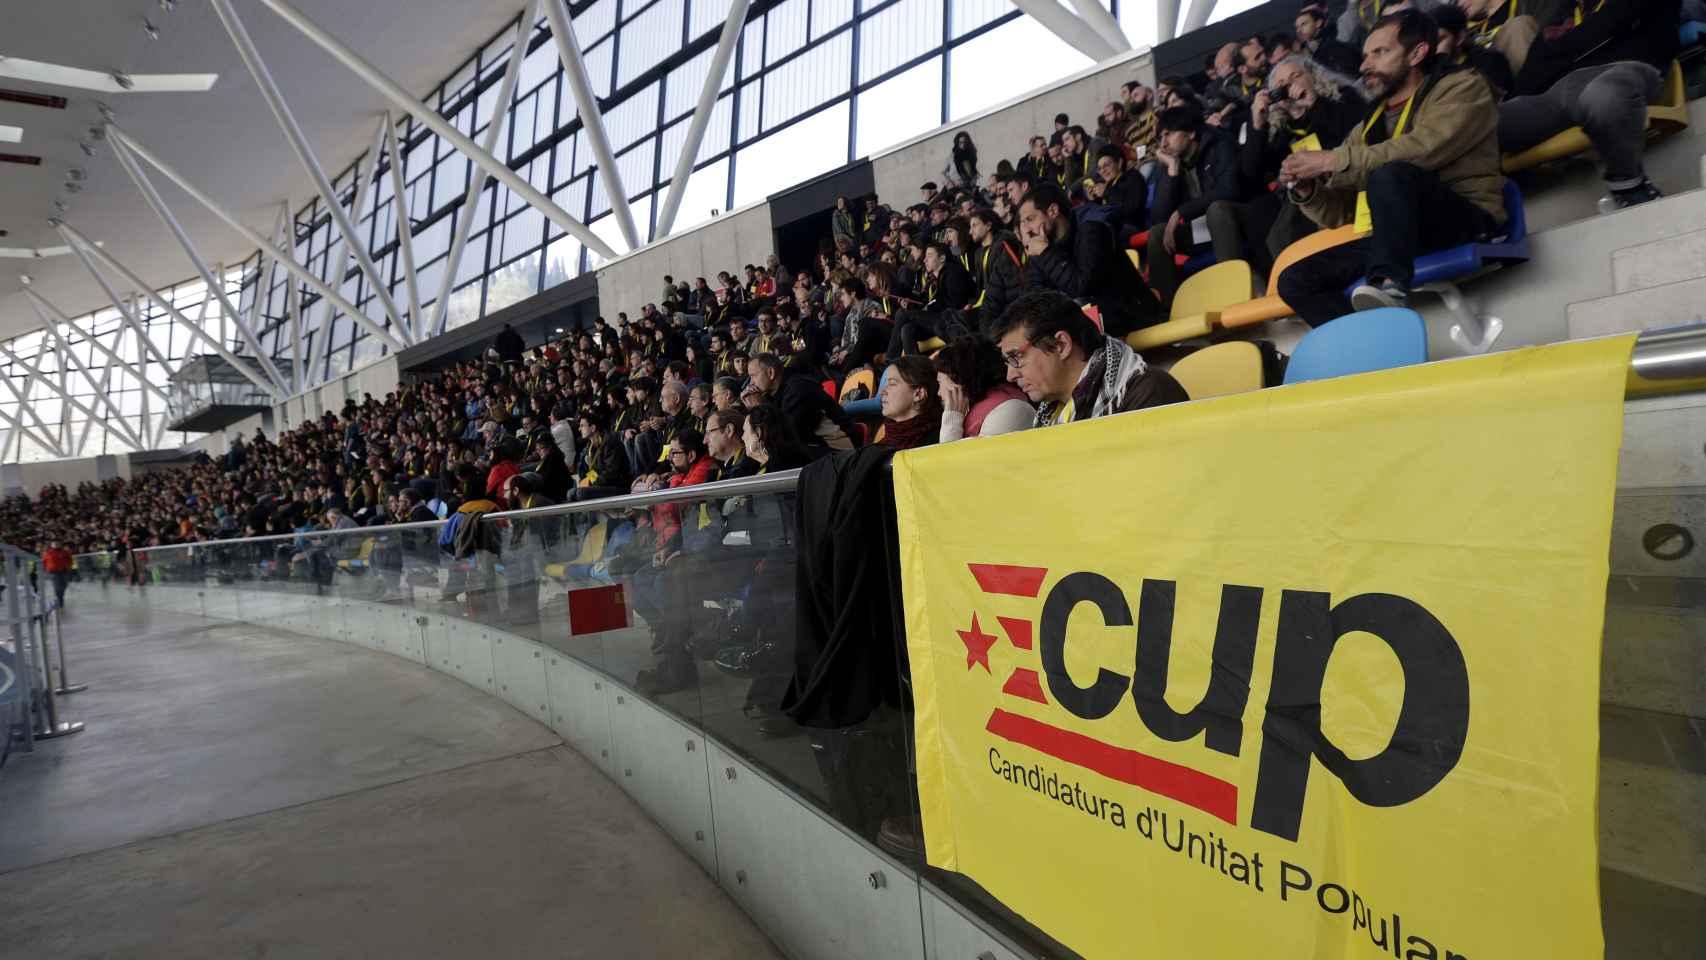 La asamblea de la CUP celebrada el pasado fin de semana.